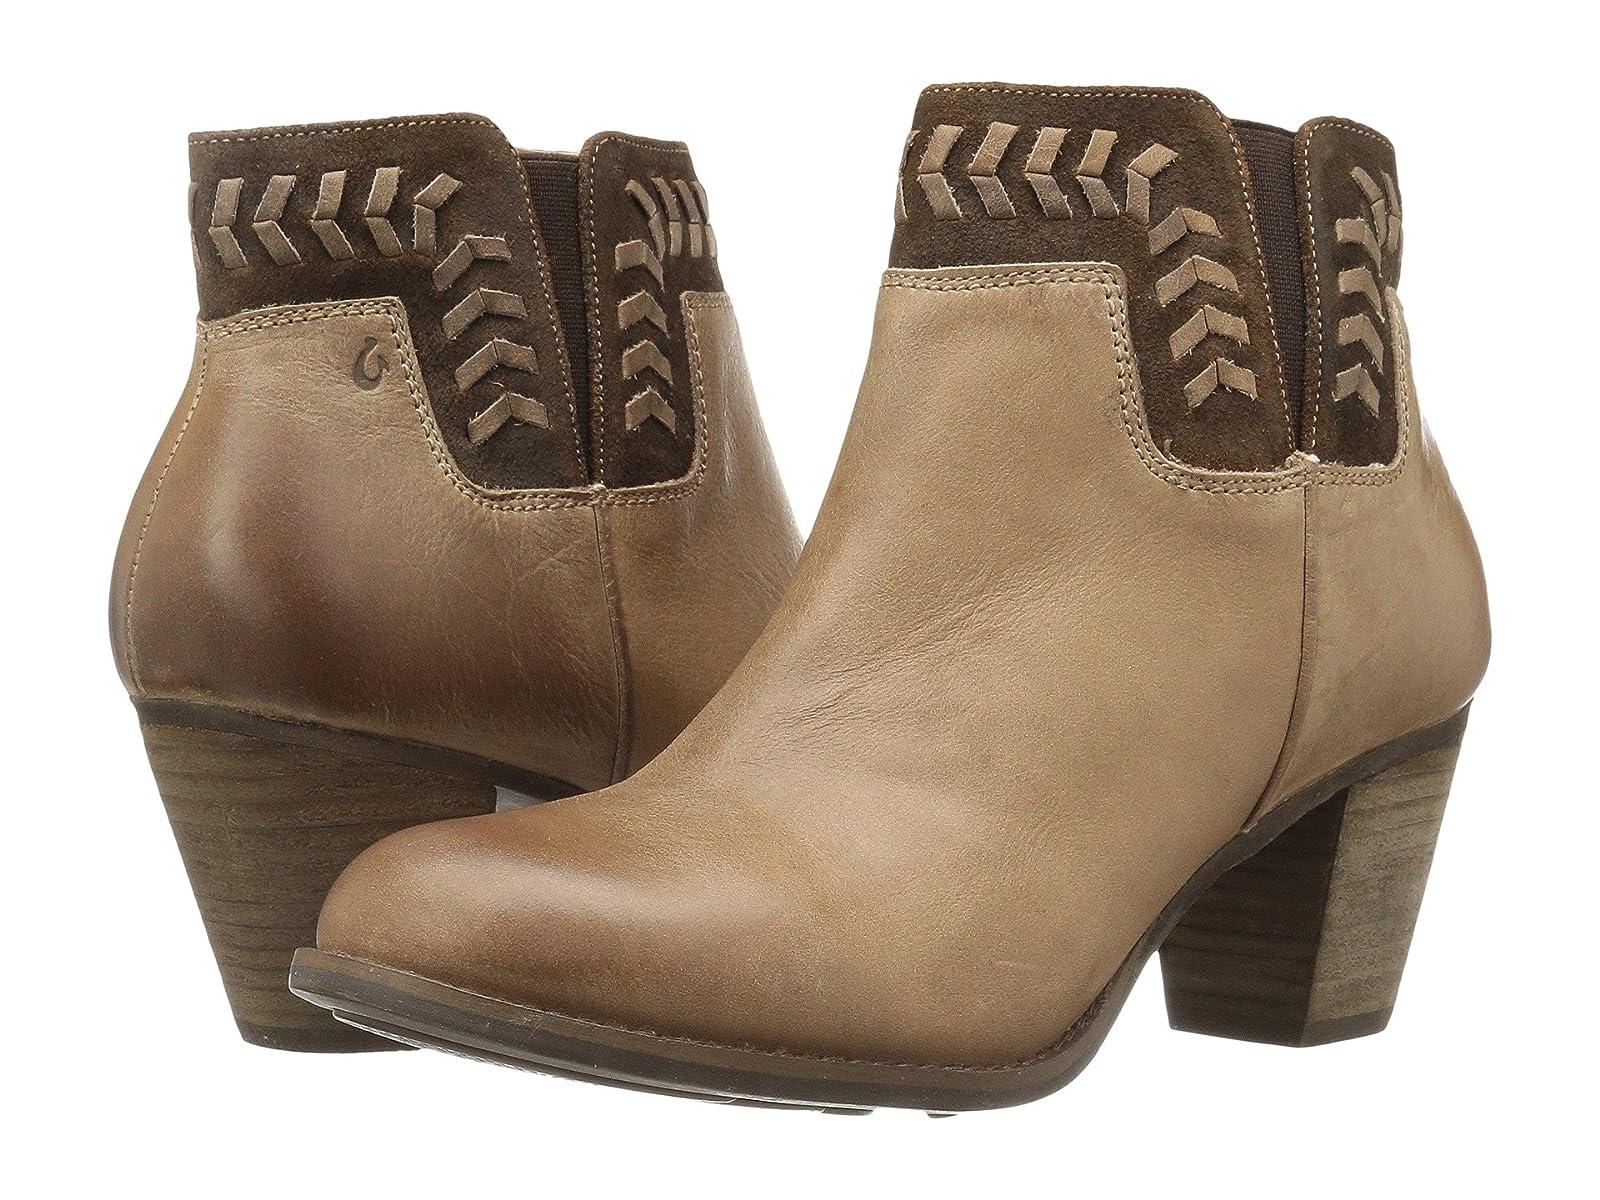 OluKai KamahoiCheap and distinctive eye-catching shoes